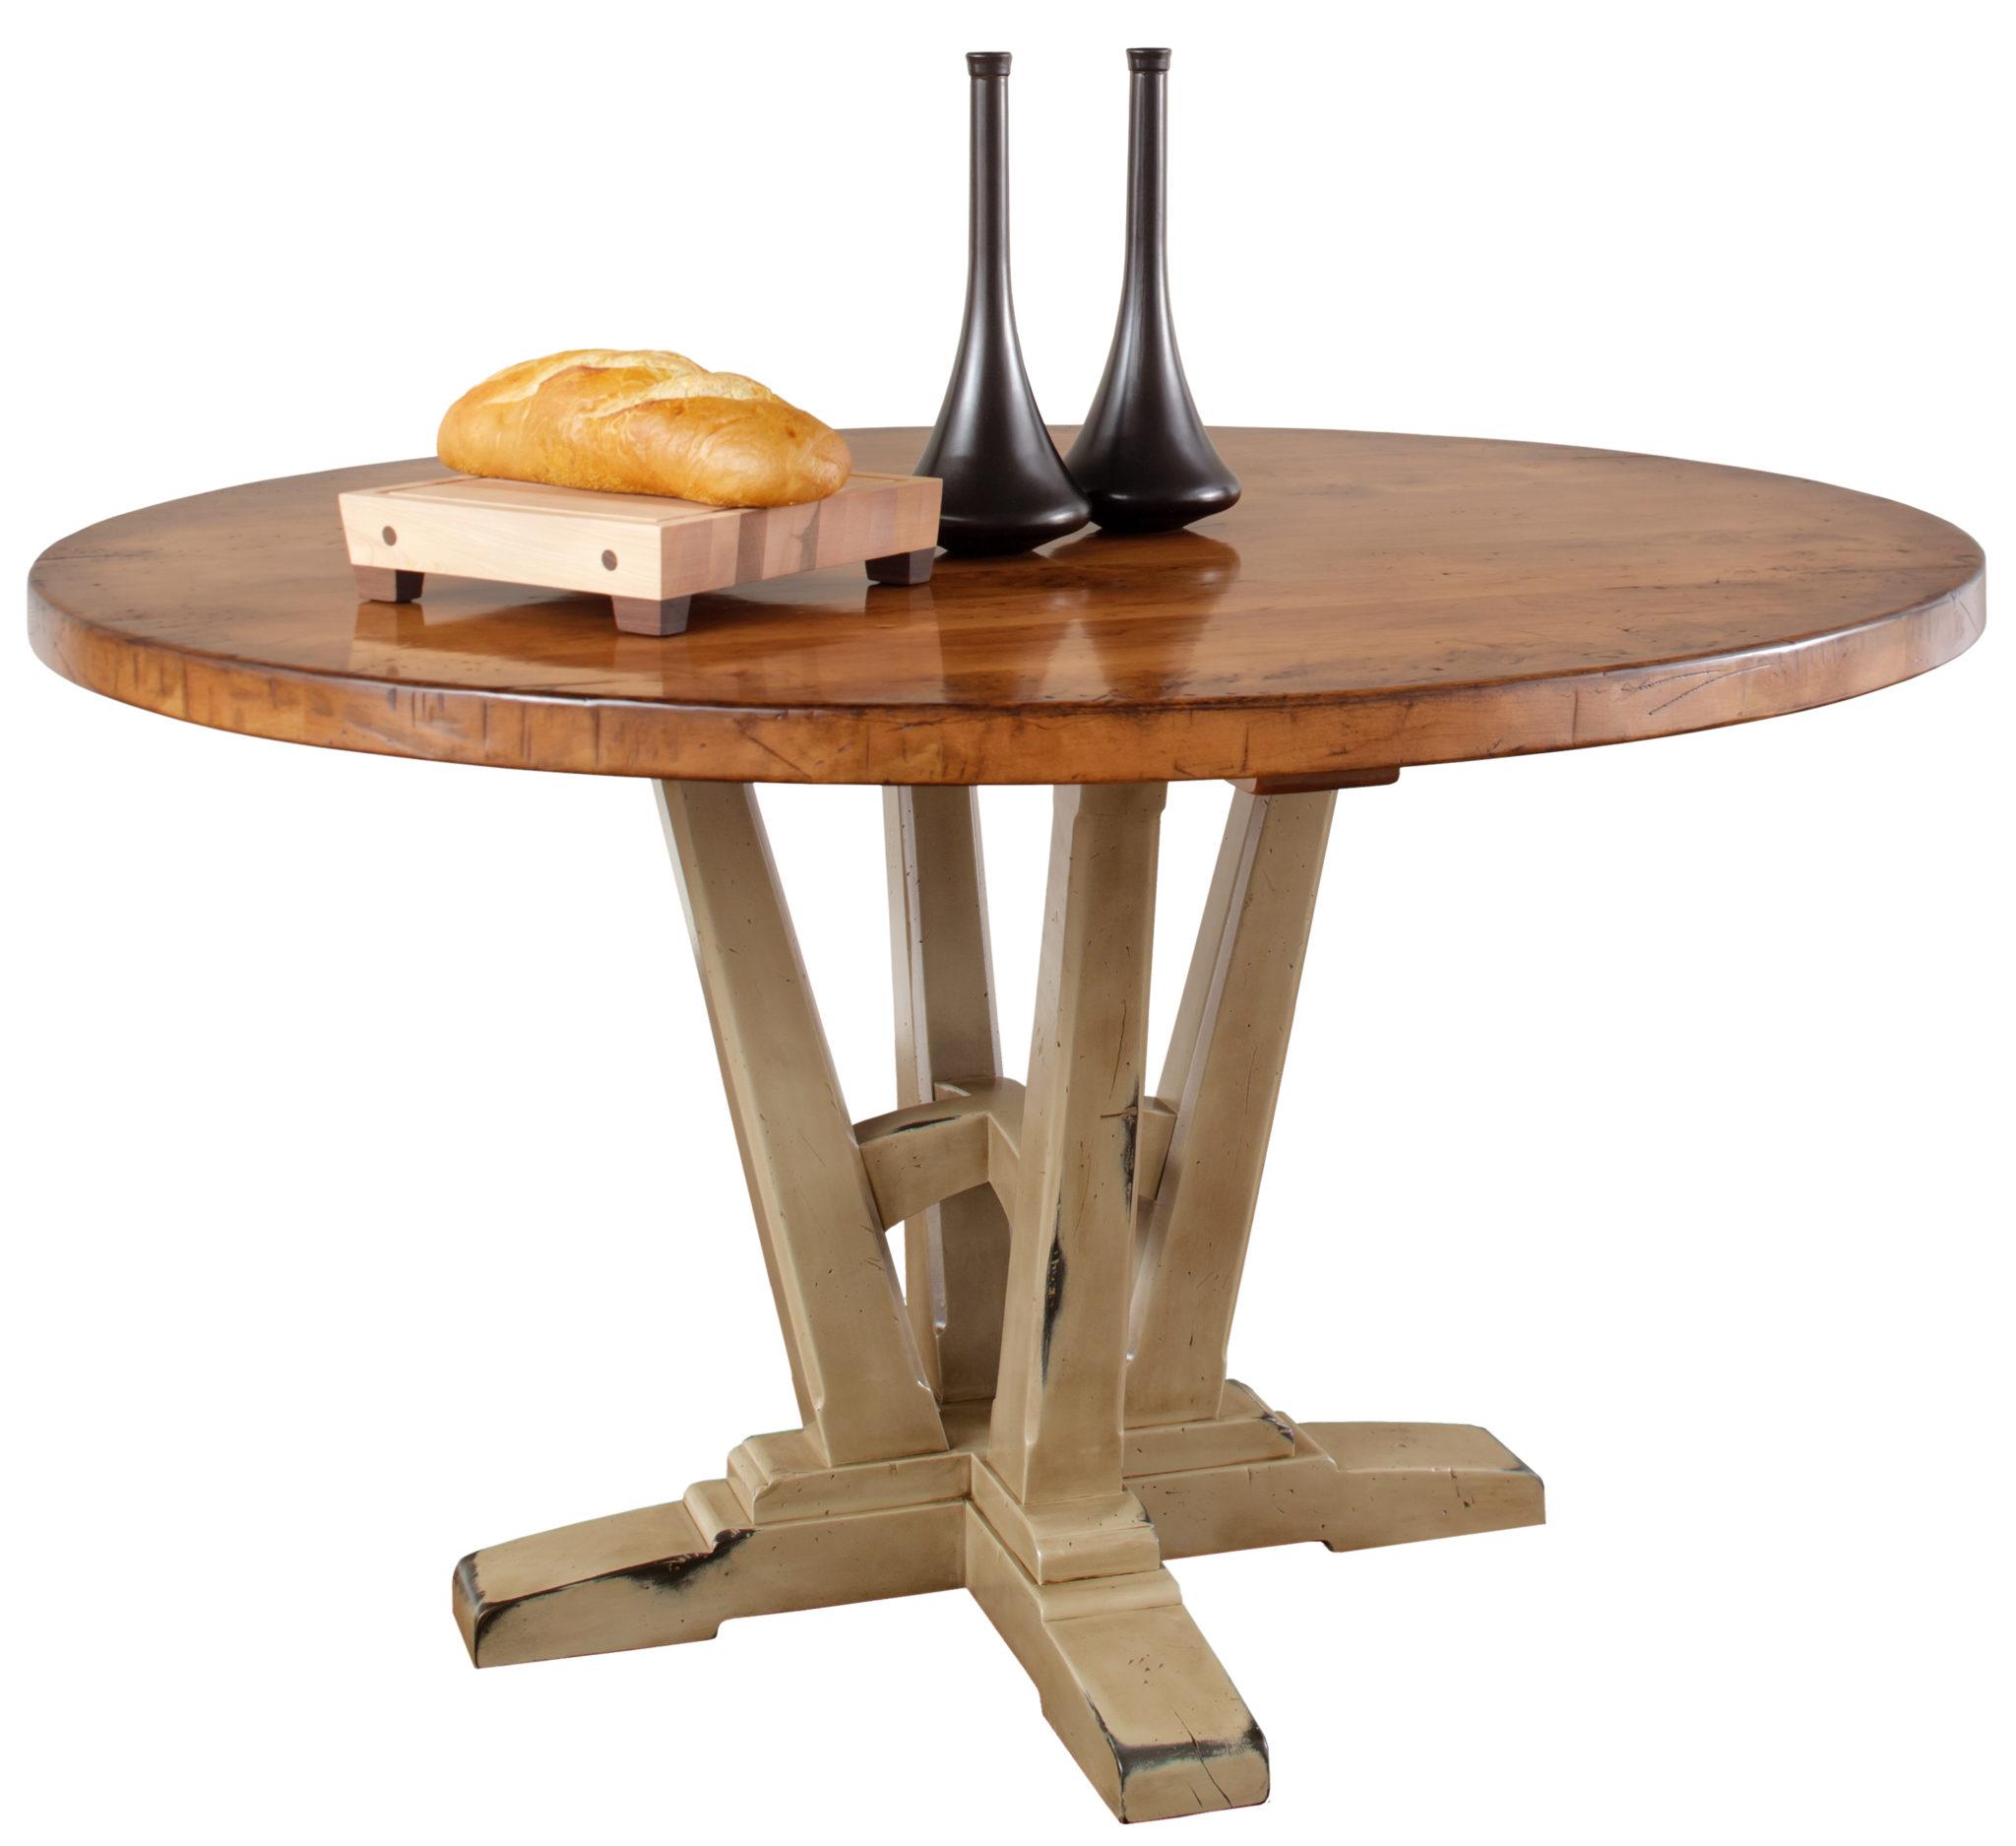 423-Coventry-Single-Pedestal-Table-2.jpg